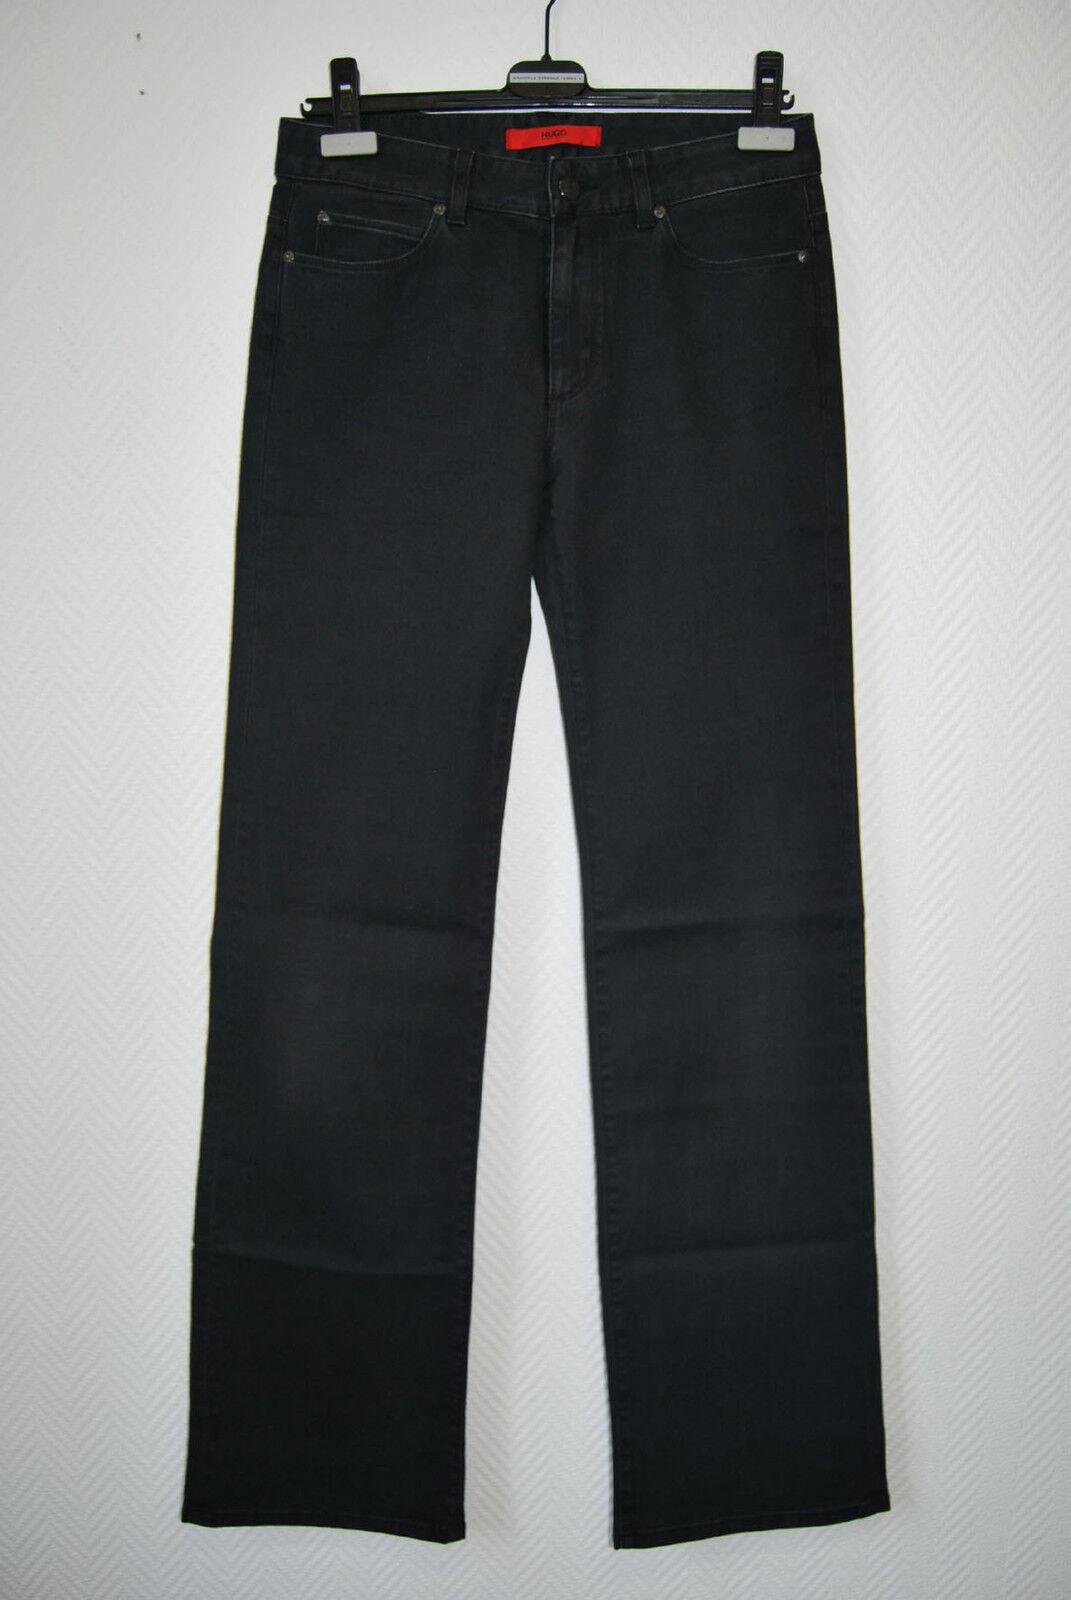 HUGO BOSS Jeans Gr 36 38 Hose DaMänner 28 34 Schwarz 199,- STRETCH D1315